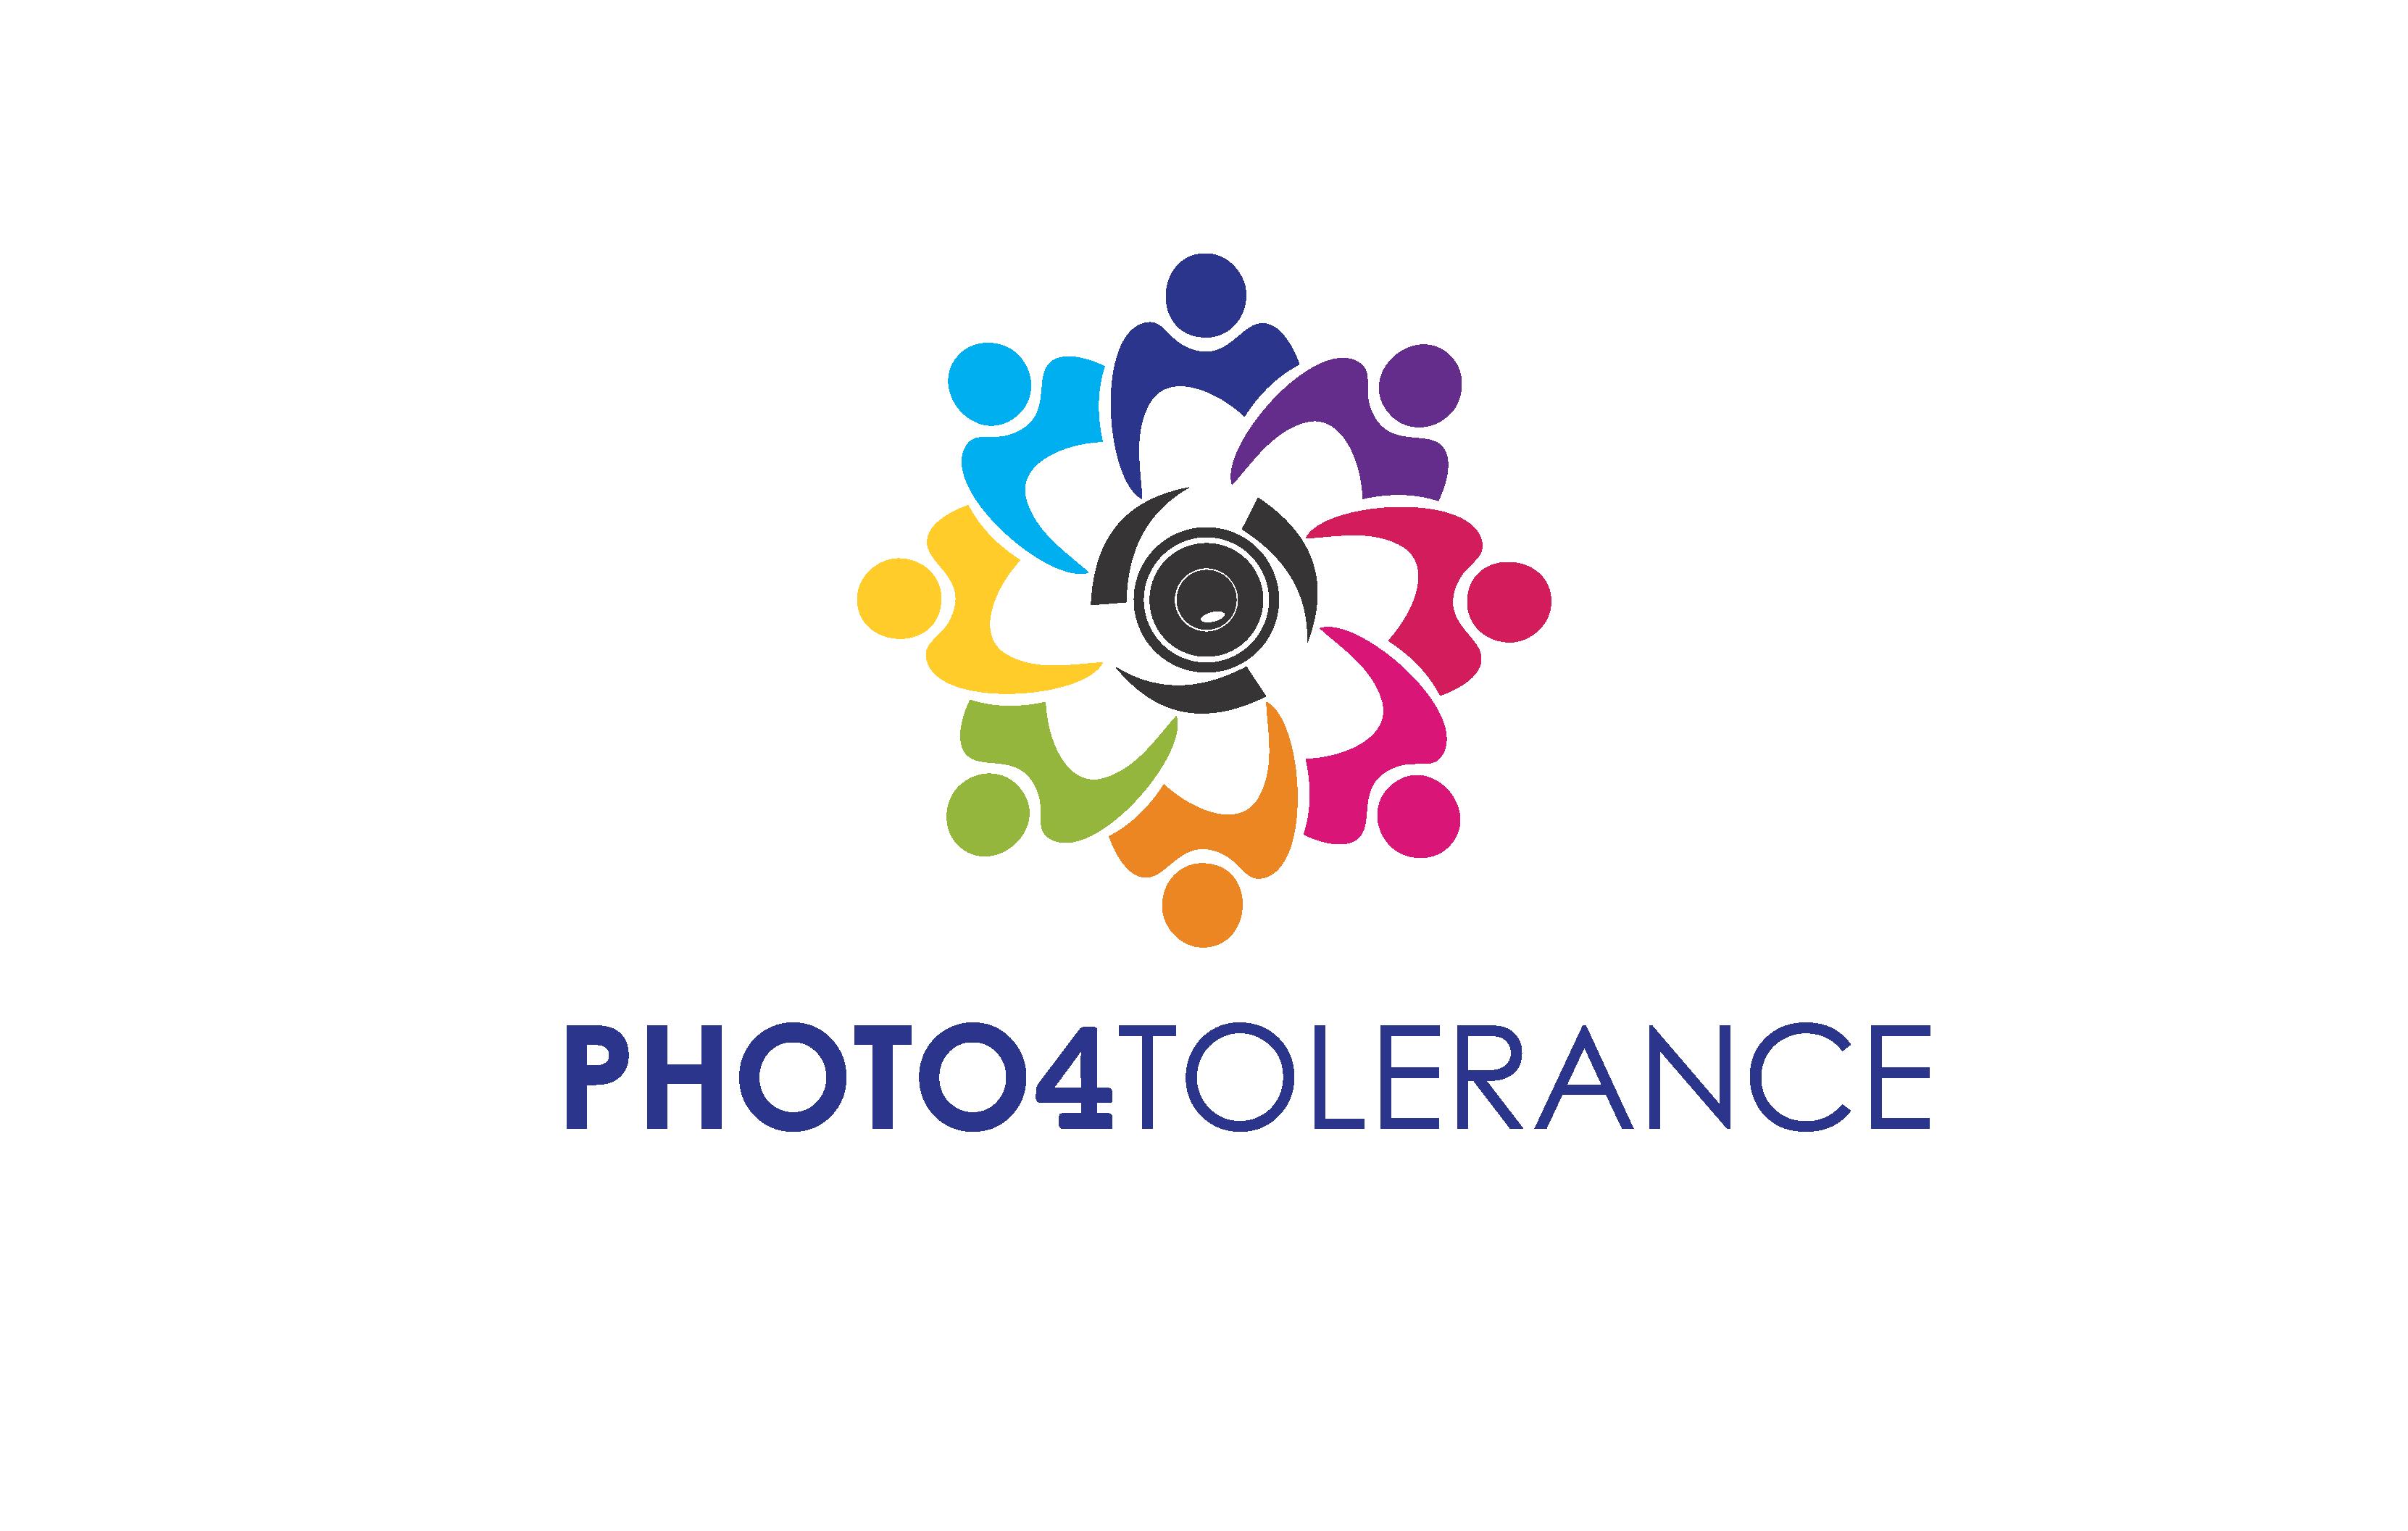 PHOTO4TOLERANCE+